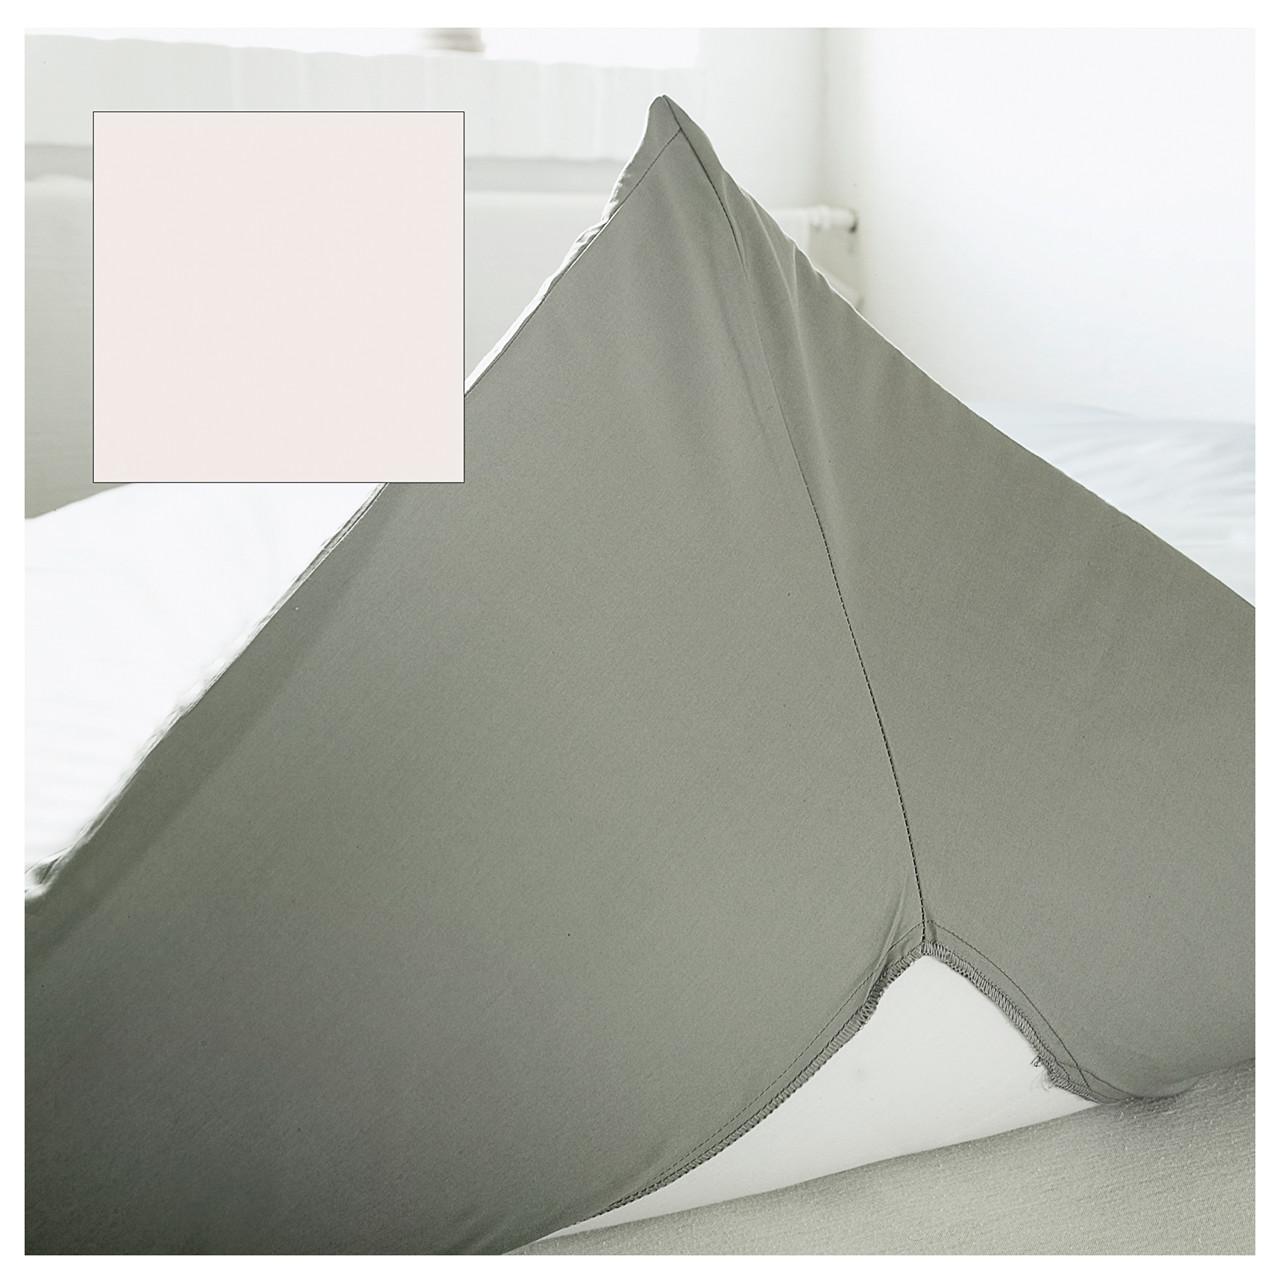 kuvertlagen Juna Percale kuvertlagen 140 X 200 cm off white » Køb her kuvertlagen